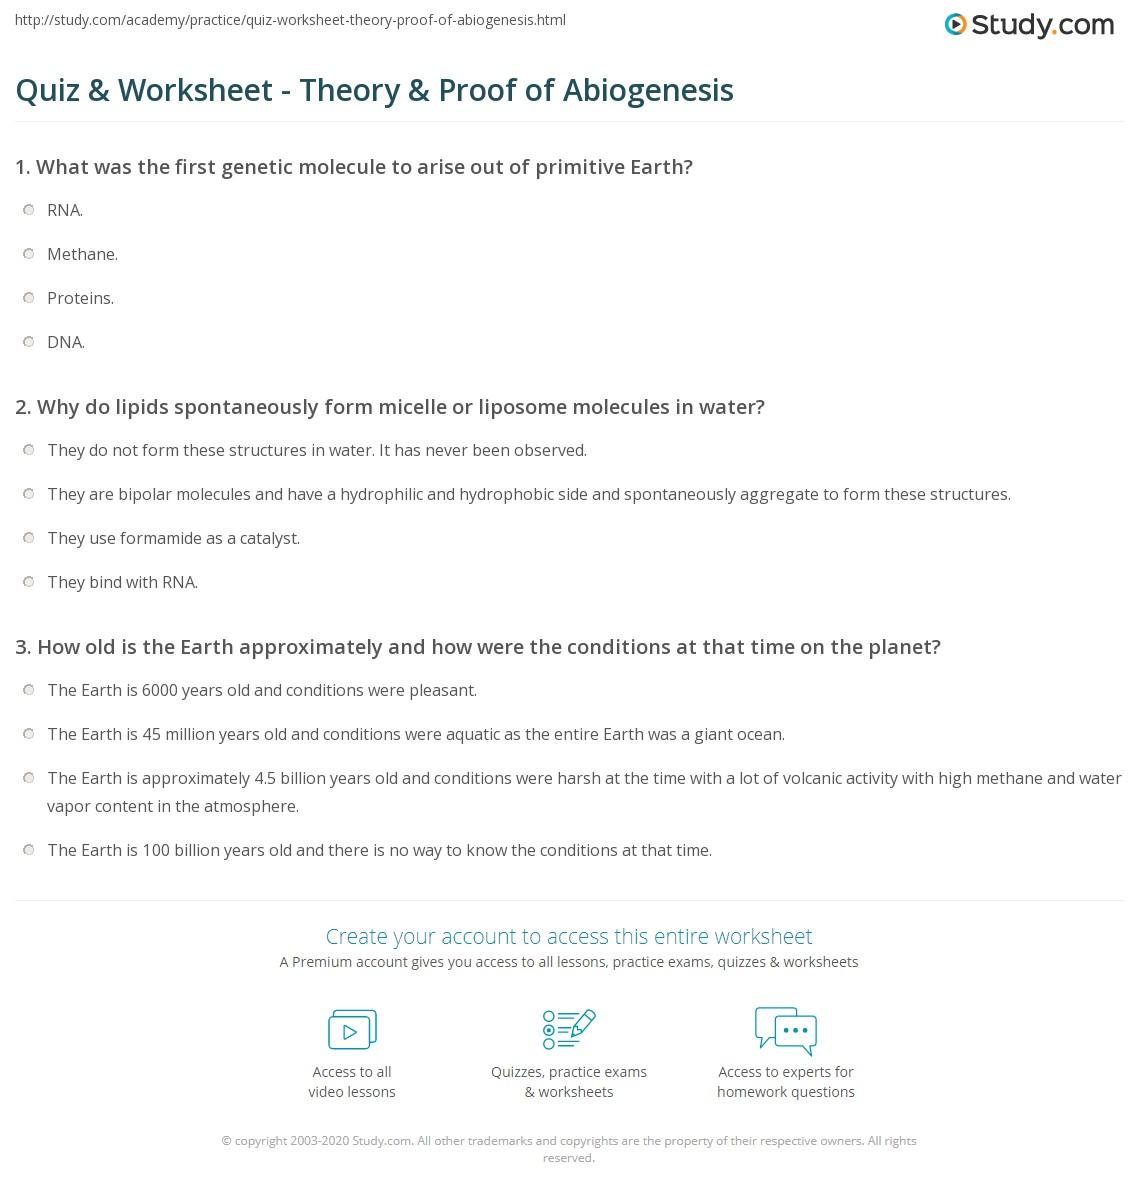 Quiz Worksheet Theory Proof of Abiogenesis – Biochemical Evidence for Evolution Worksheet